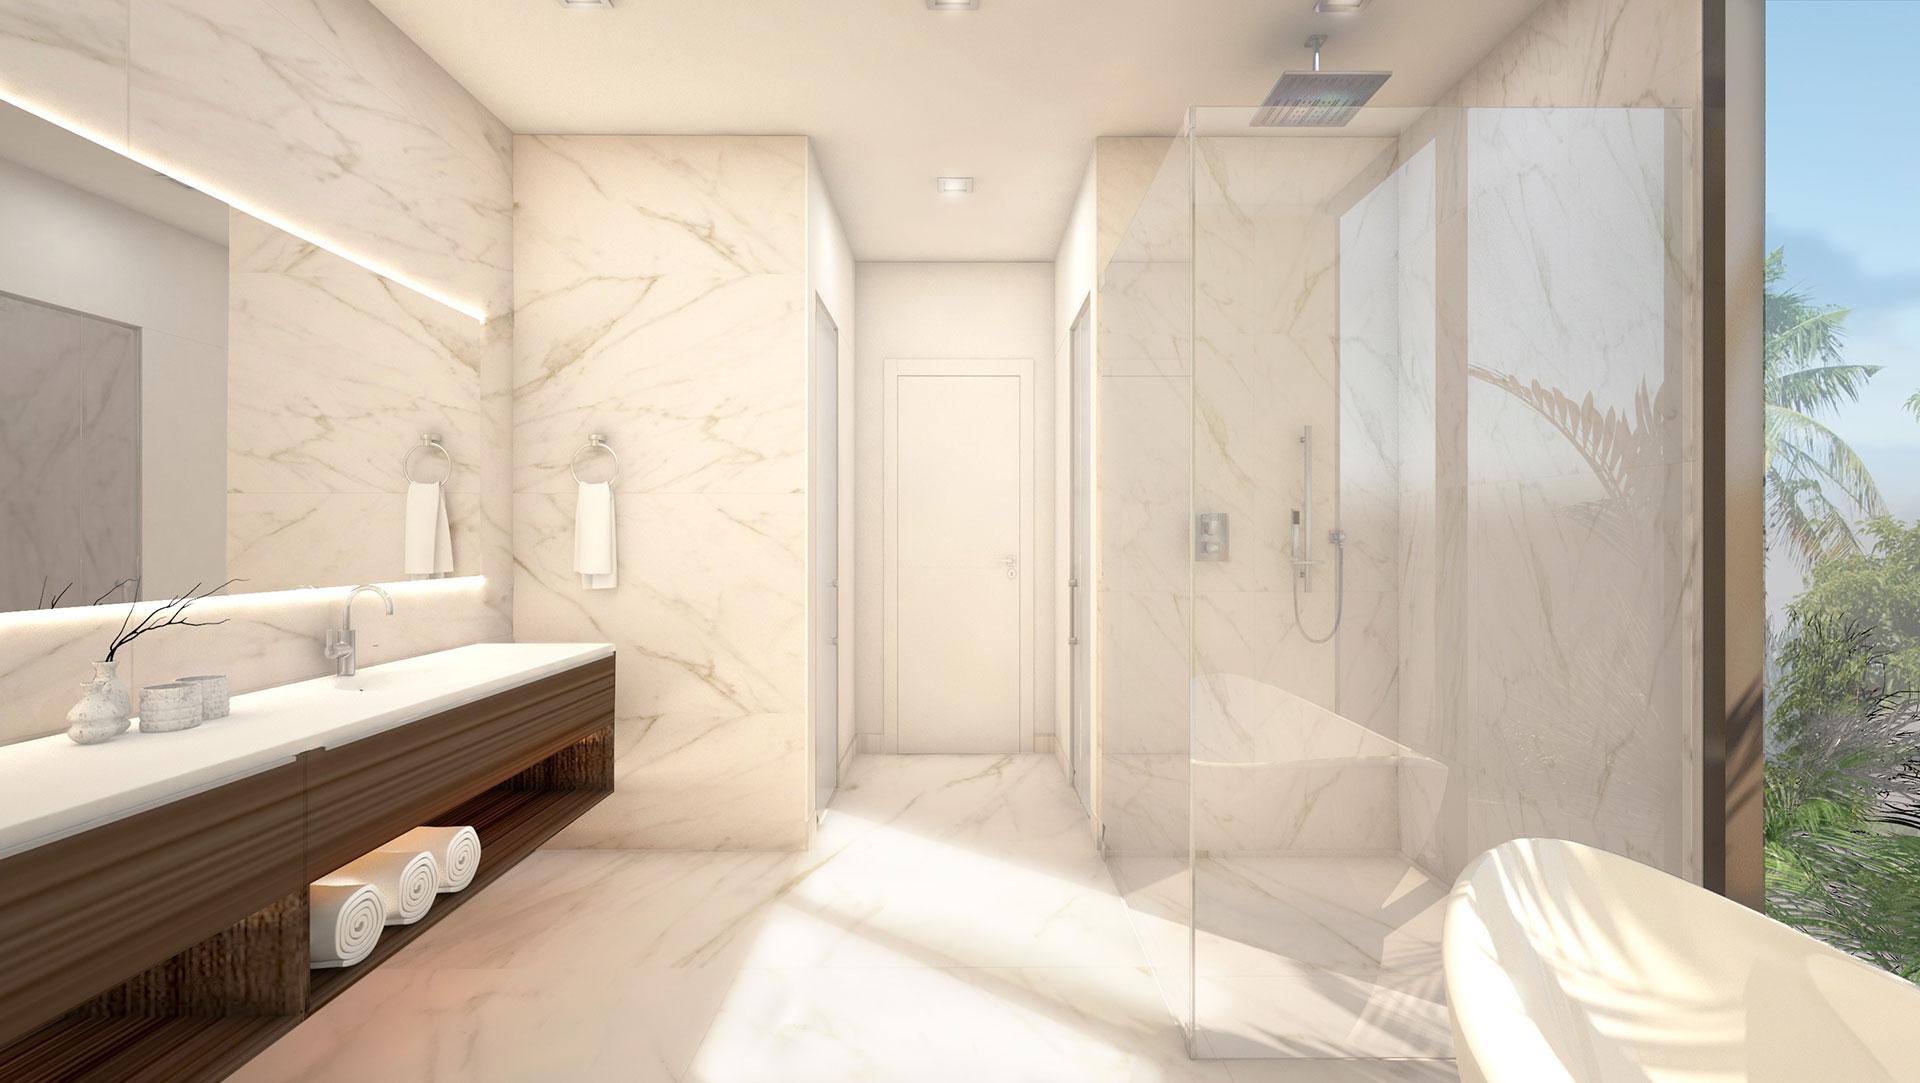 Interior Design side view bathroom project in Douglas RD, Florida